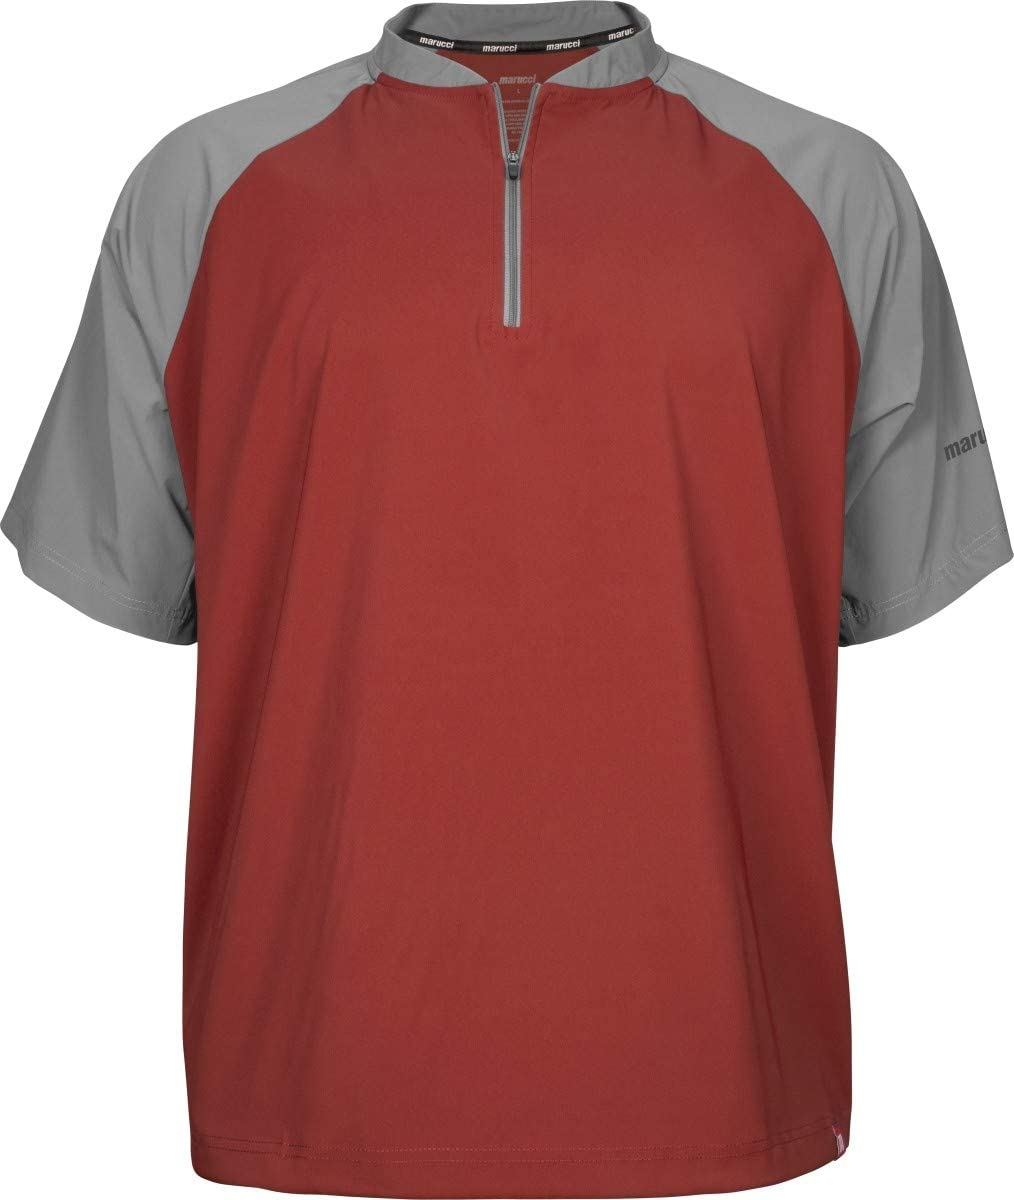 marucci-team-cage-jacket-red-matcgj-r-al-baseball-outerwear MATCGJ-R-L Marucci